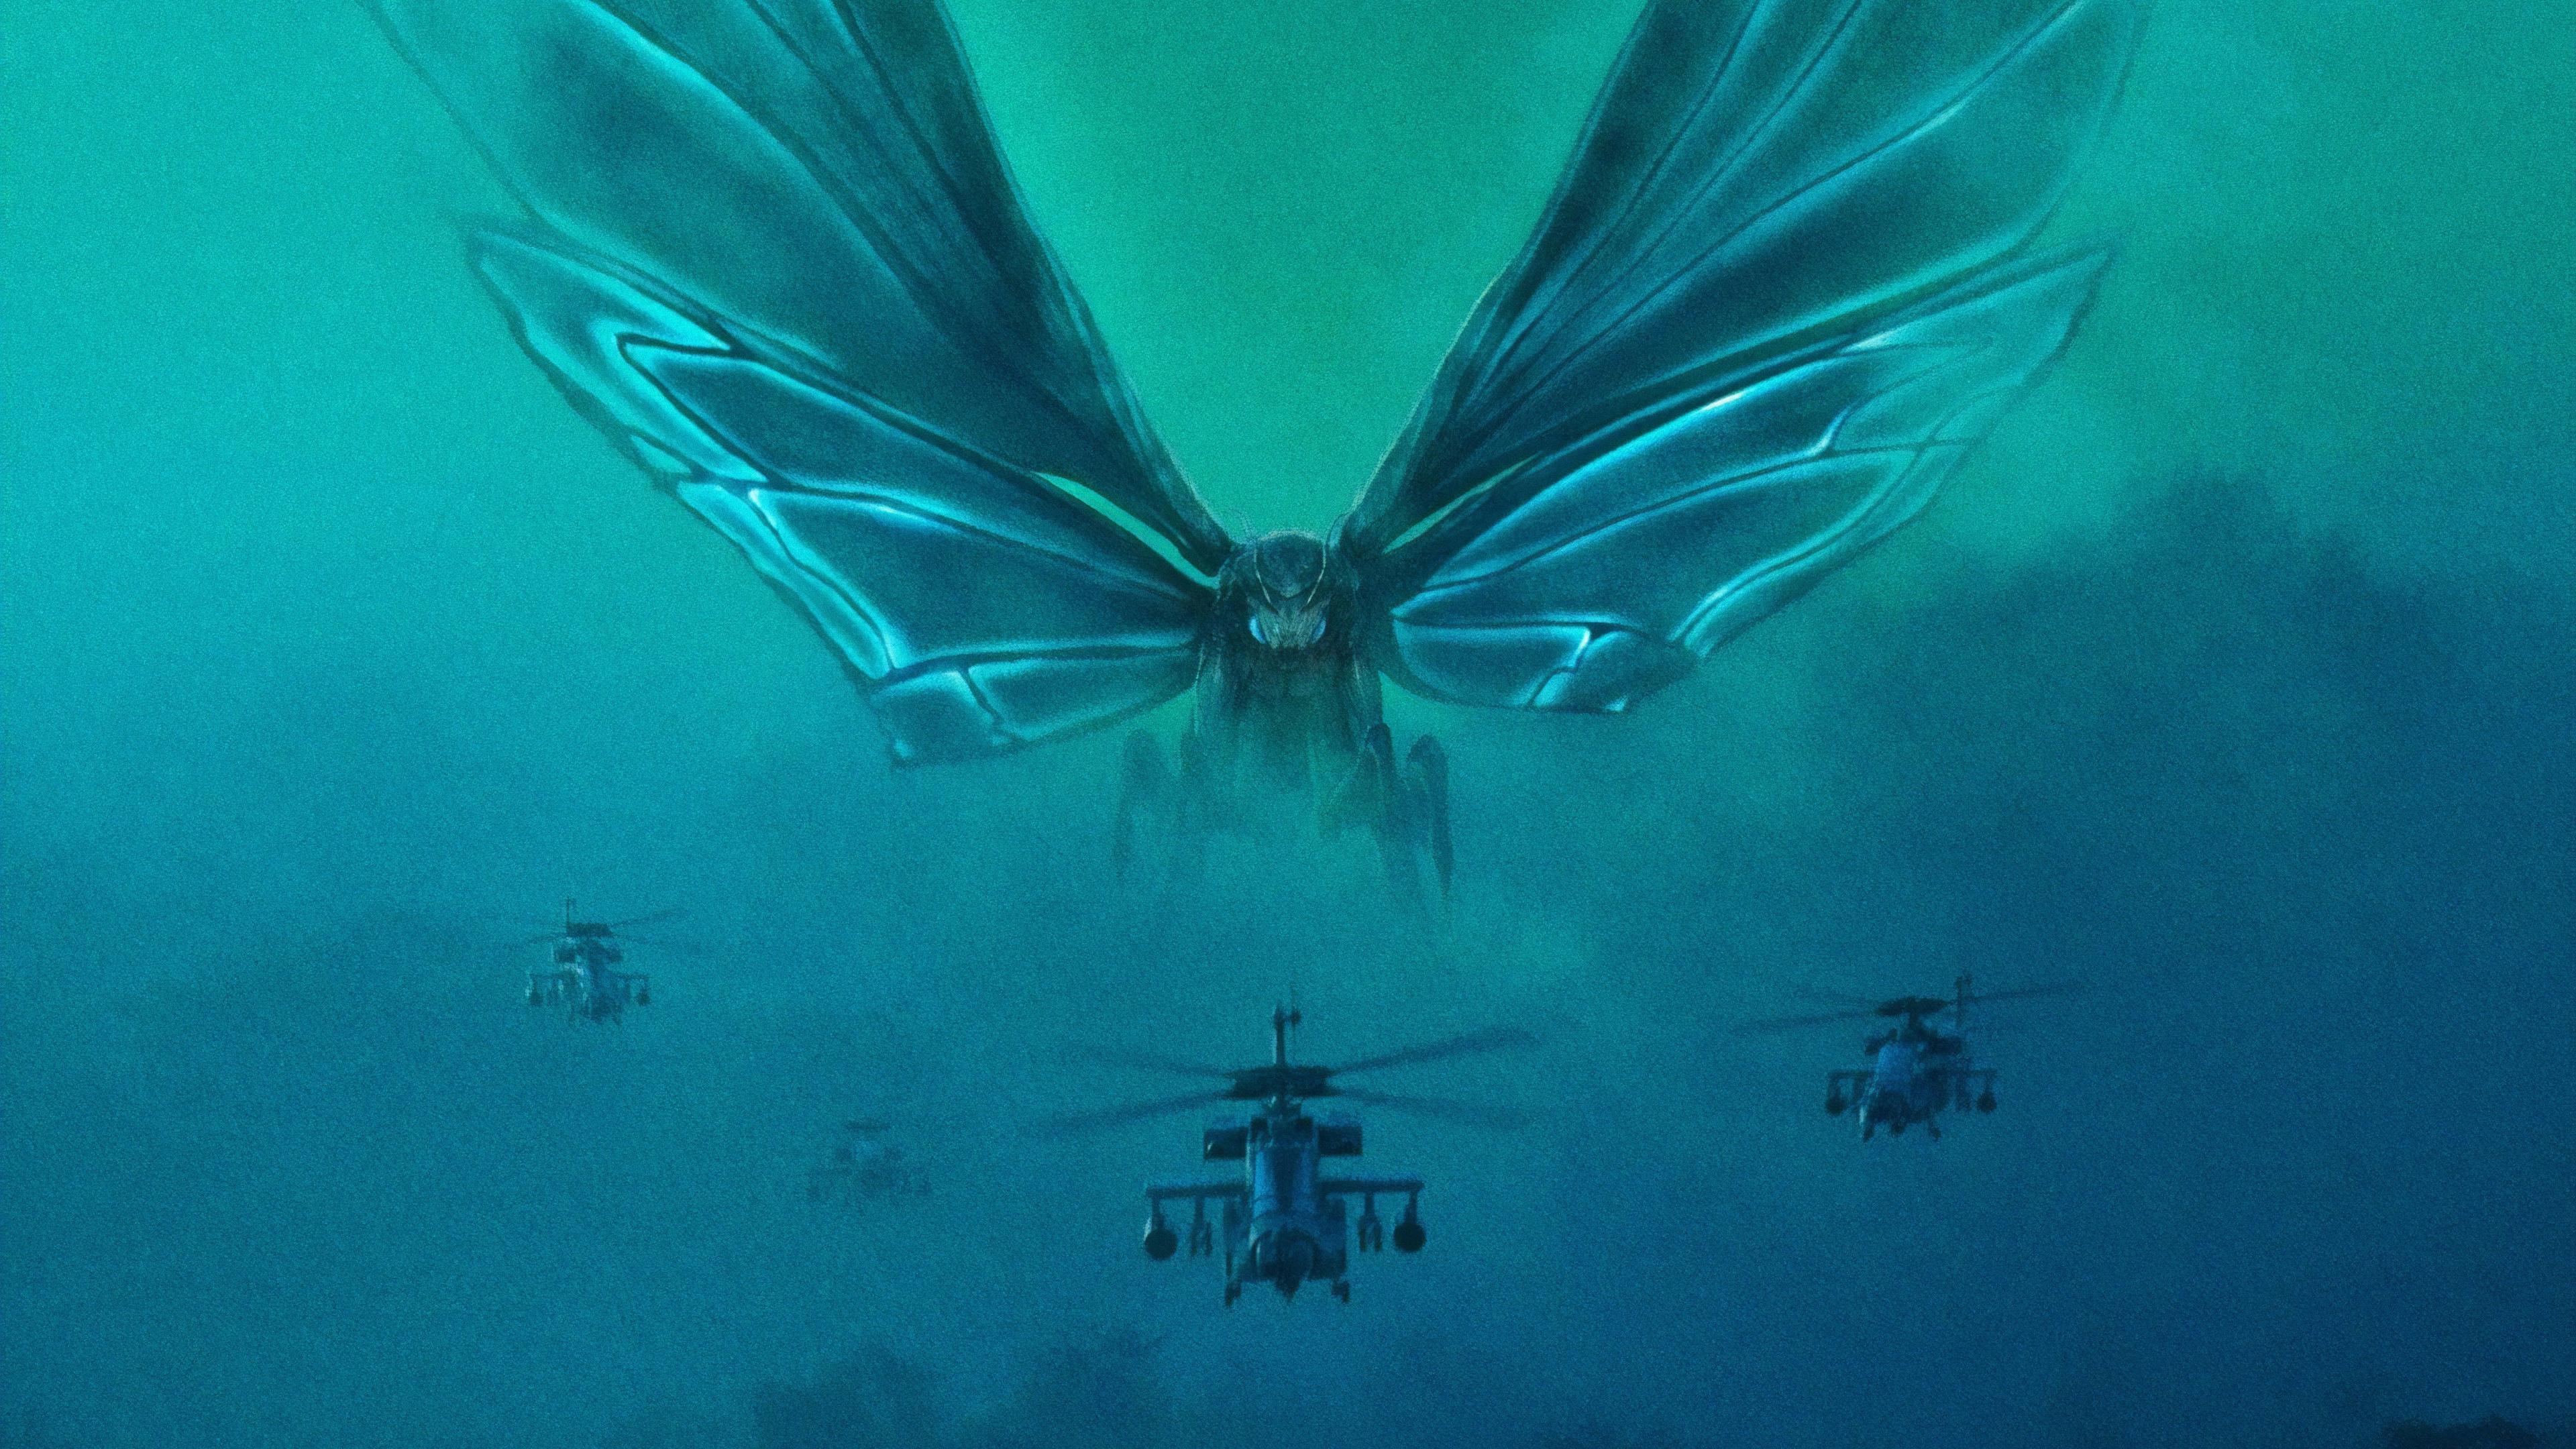 Wallpaper 4k Mothra Godzilla King Of The Monsters 4k 2019 Movies